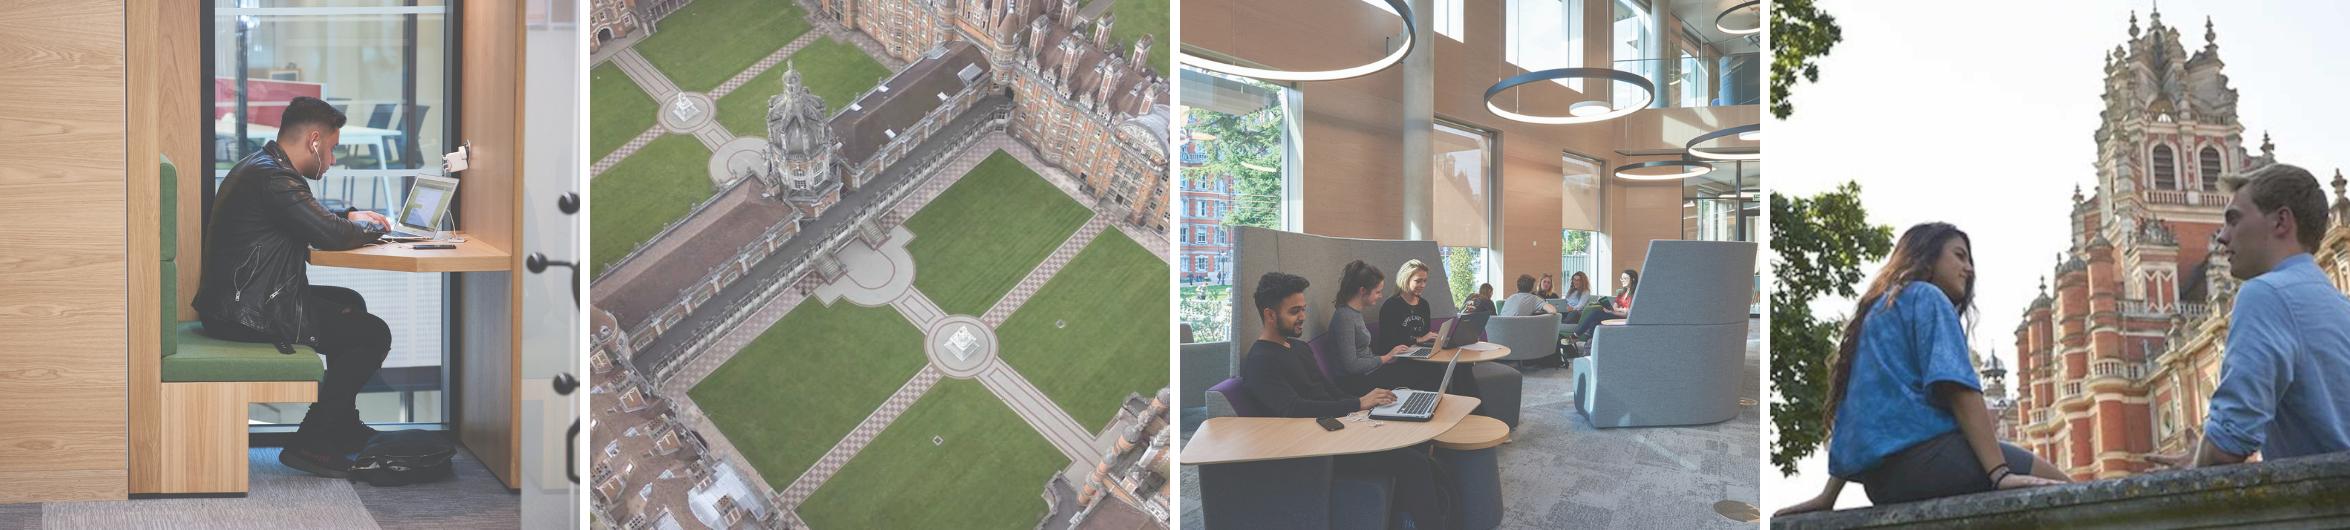 MSc Finance - Royal Holloway University of London